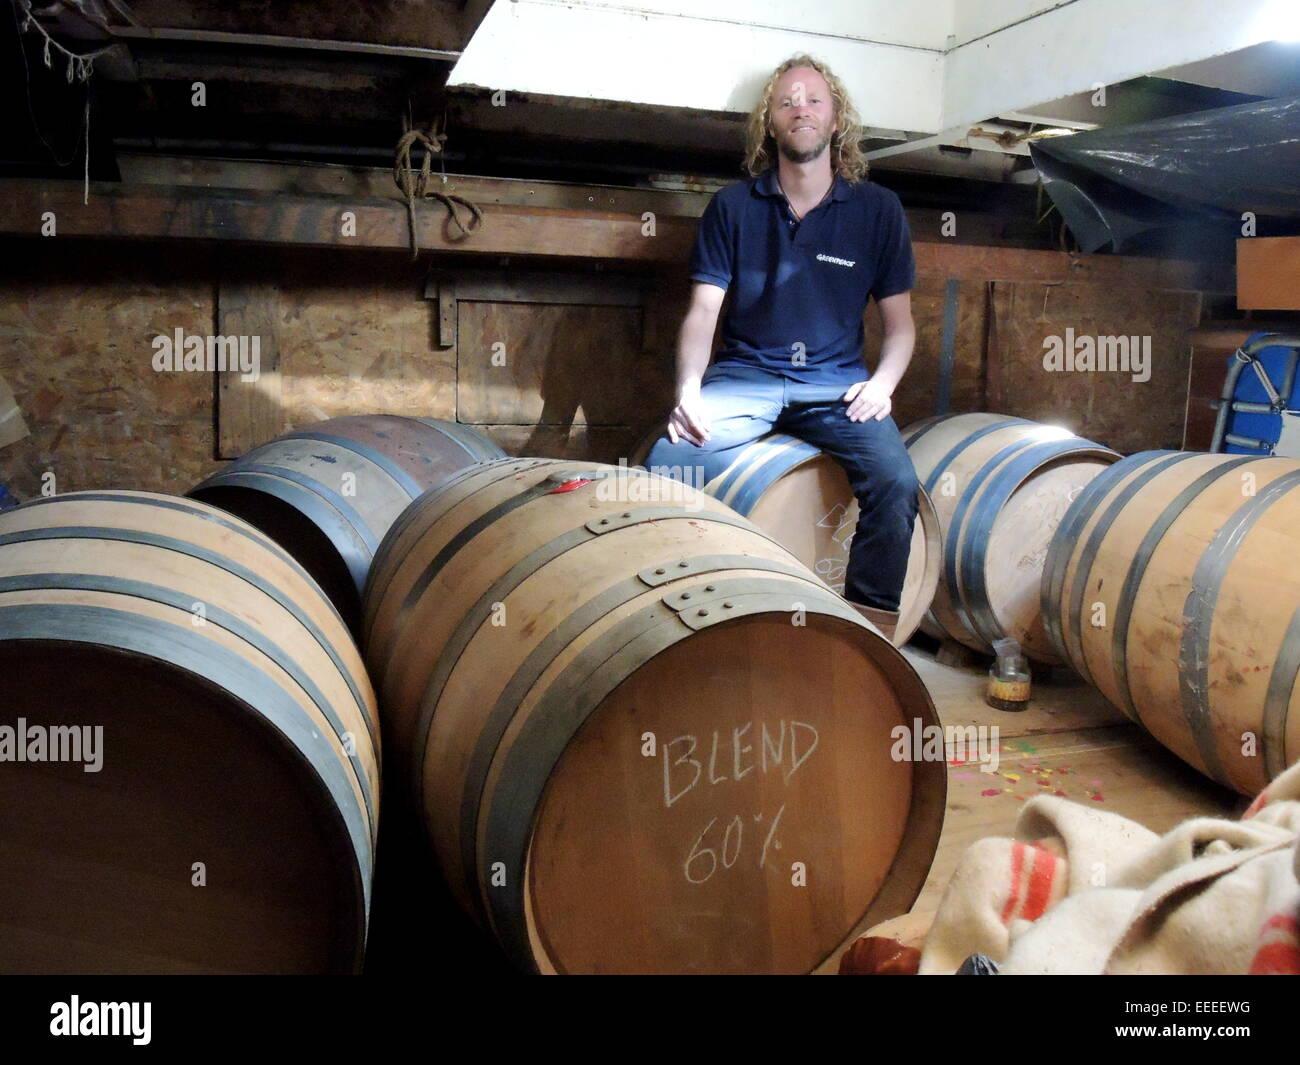 Arjen van der Veen, dutch copartner of the fairtrade society 'Tres hombres', sitting on barrels of rhum - Stock Image